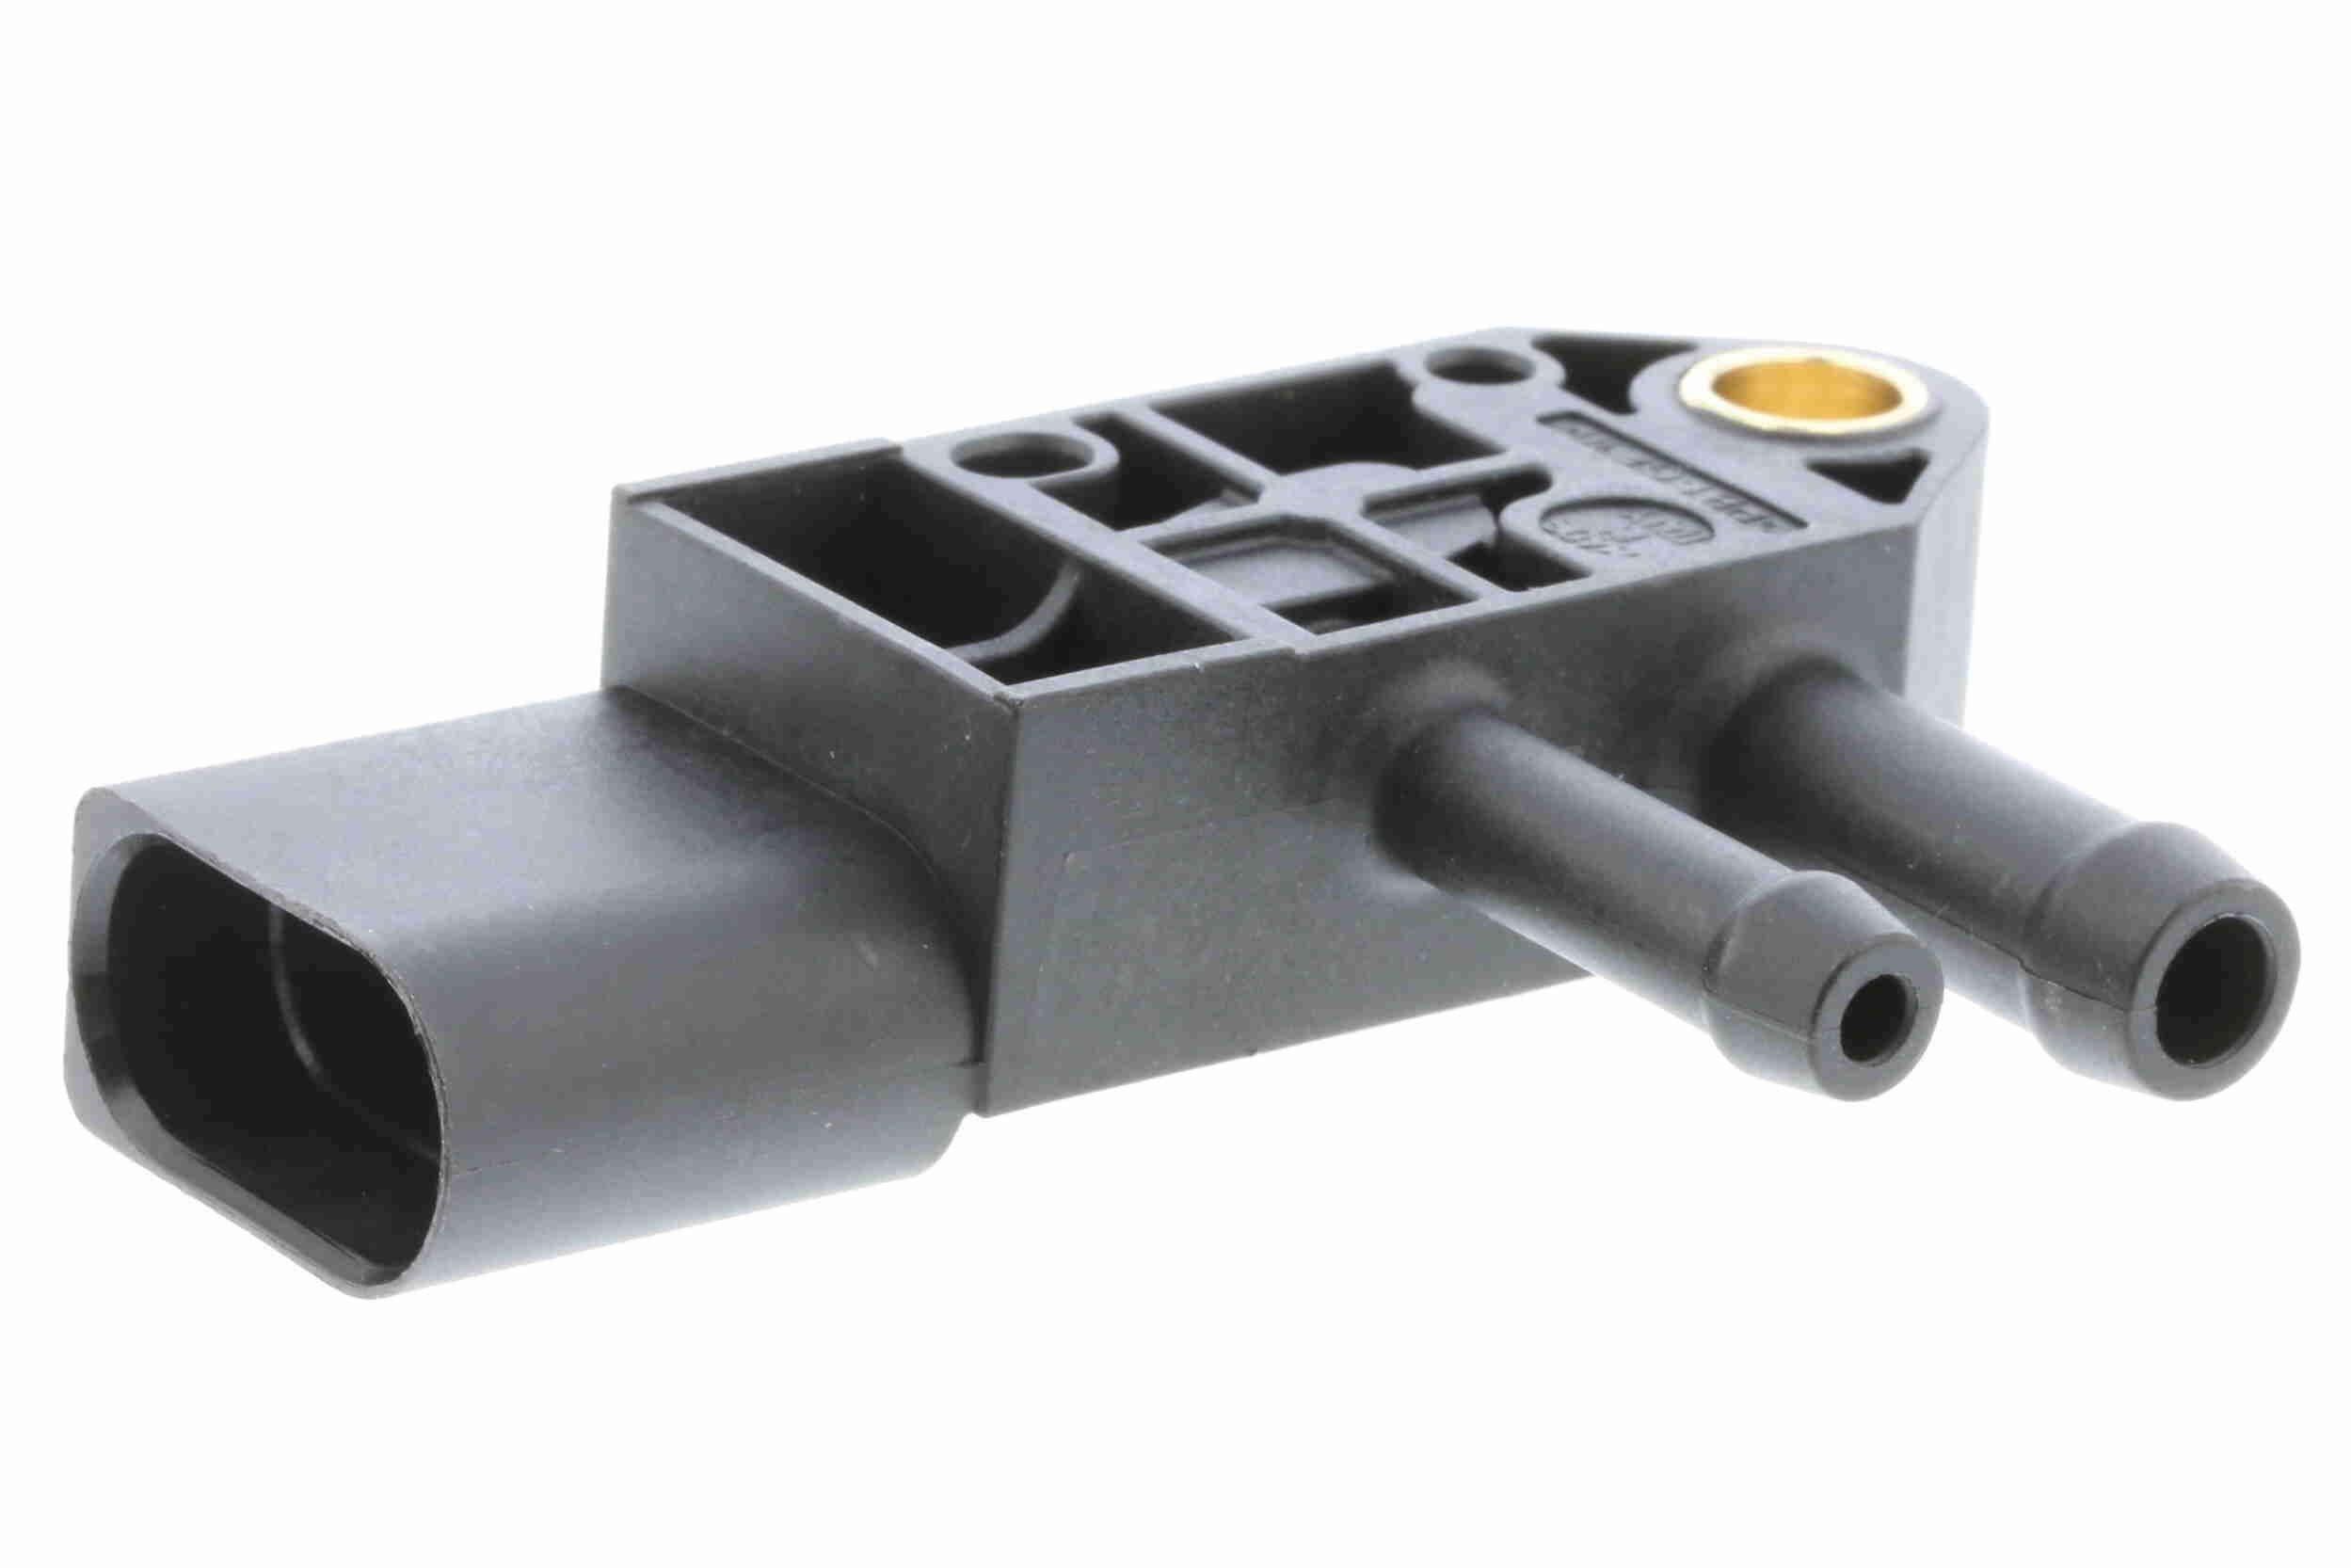 Volkswagen EOS 2012 Exhaust gas pressure sensor VEMO V10-72-1207: Original VEMO Quality